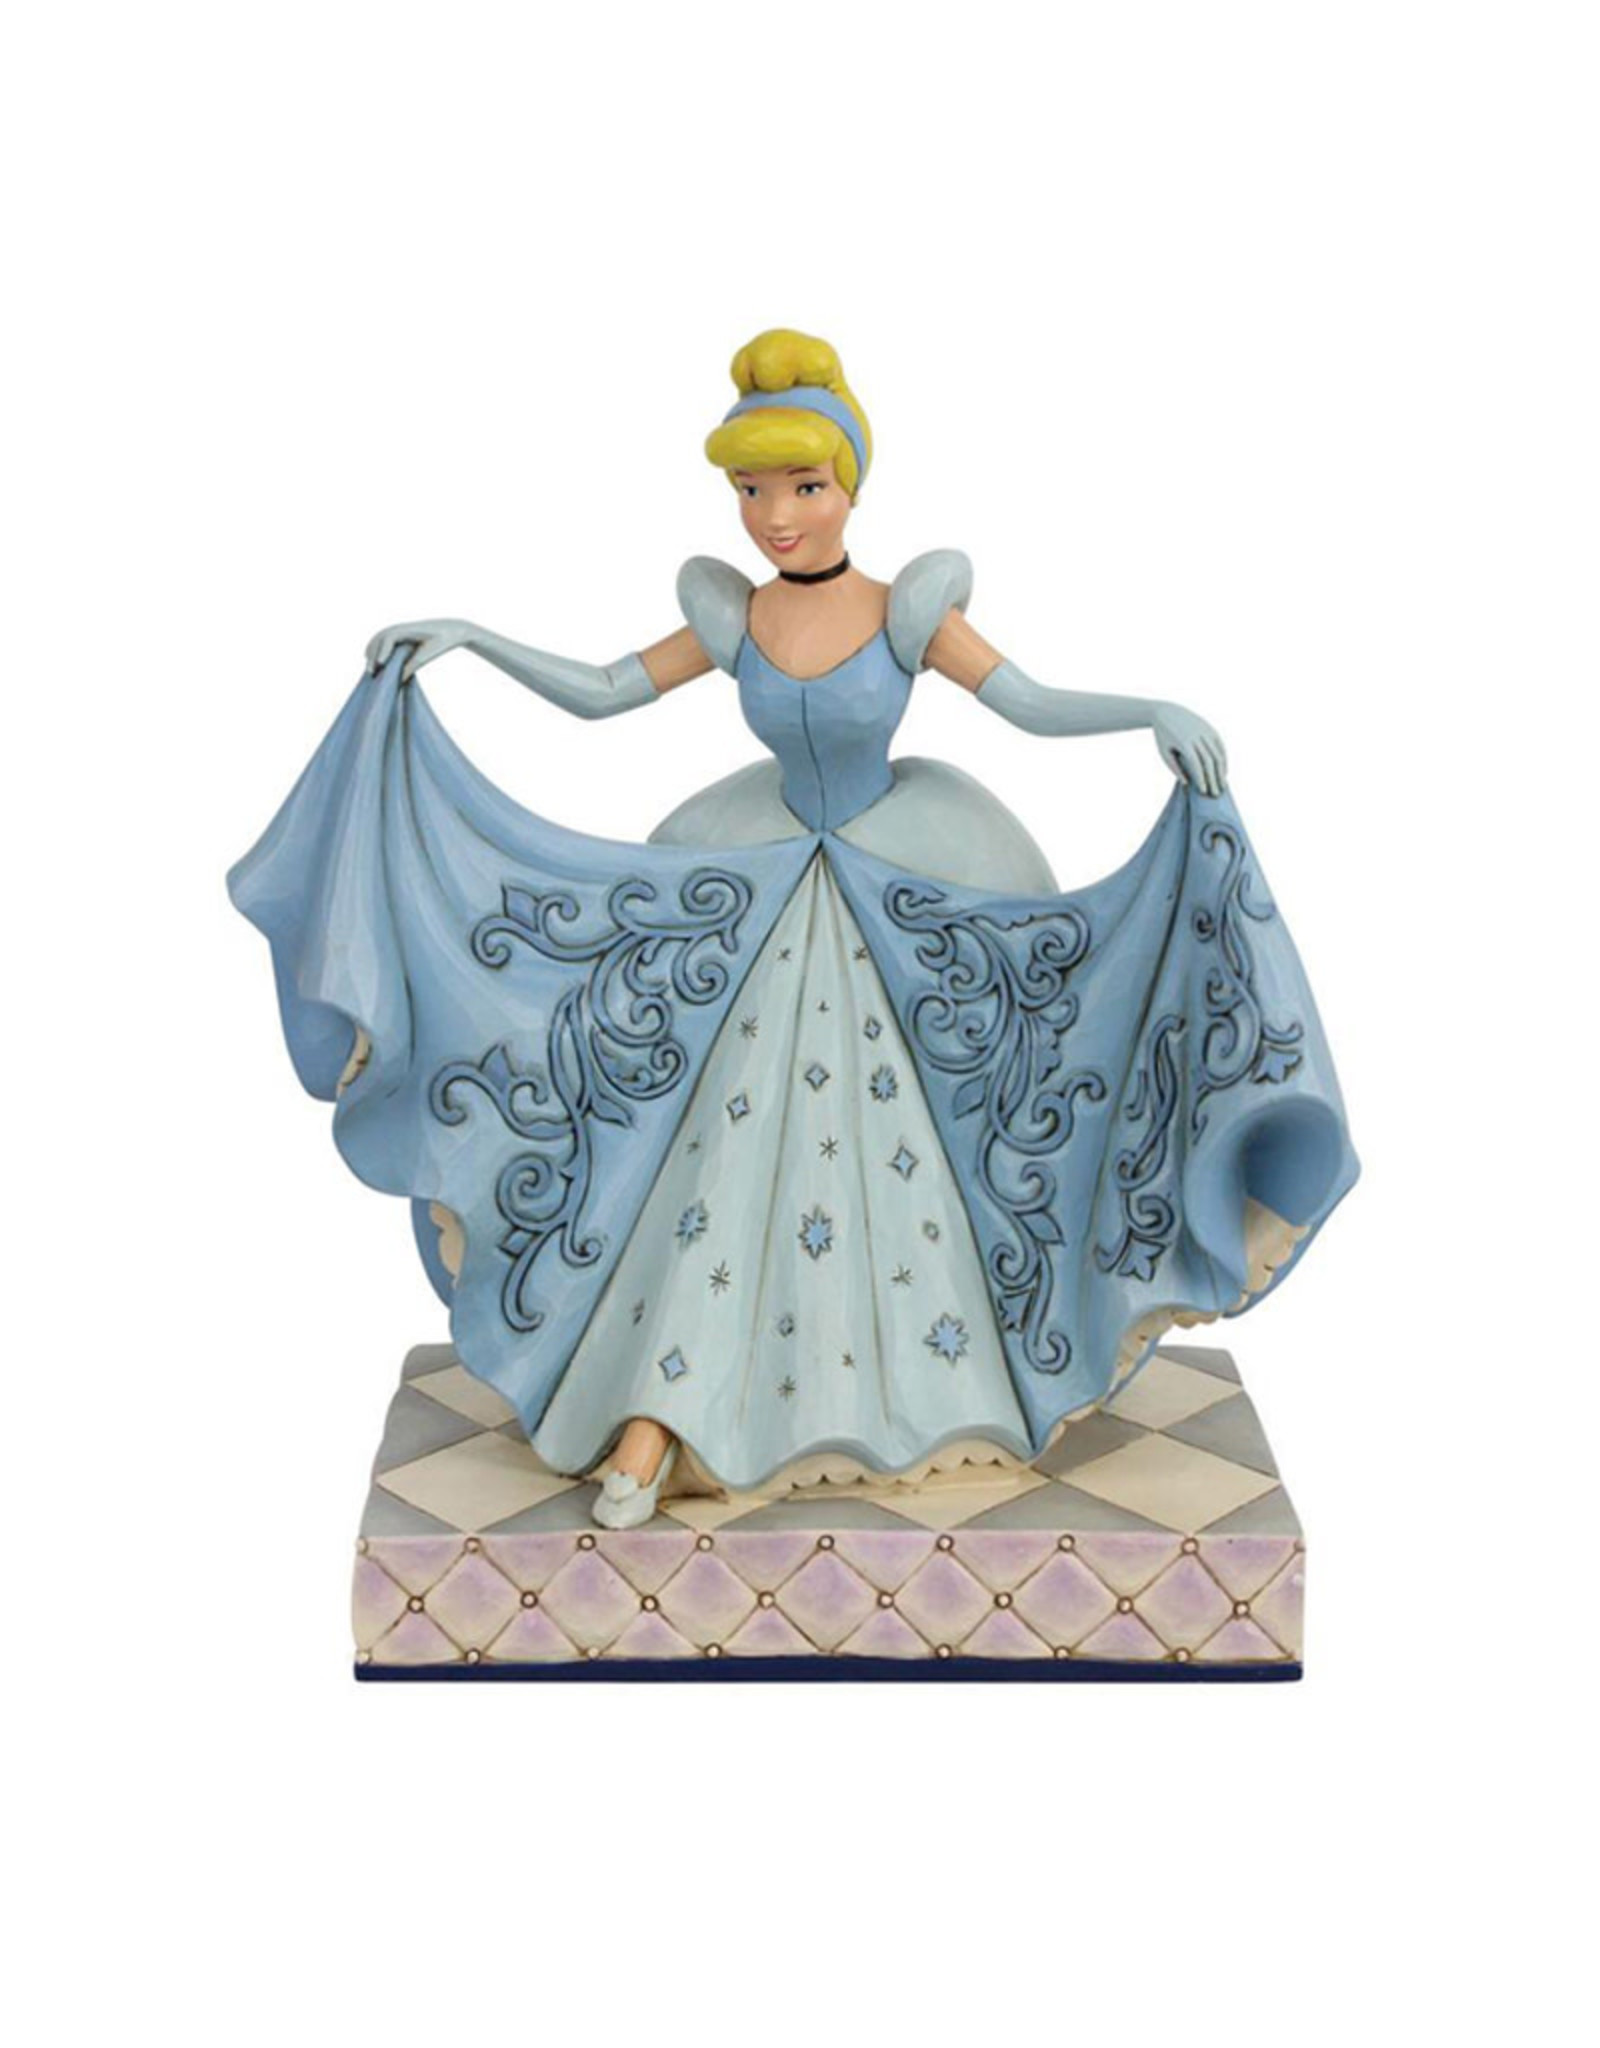 Disney Disney ( Disney Traditions Figurine ) Cinderella